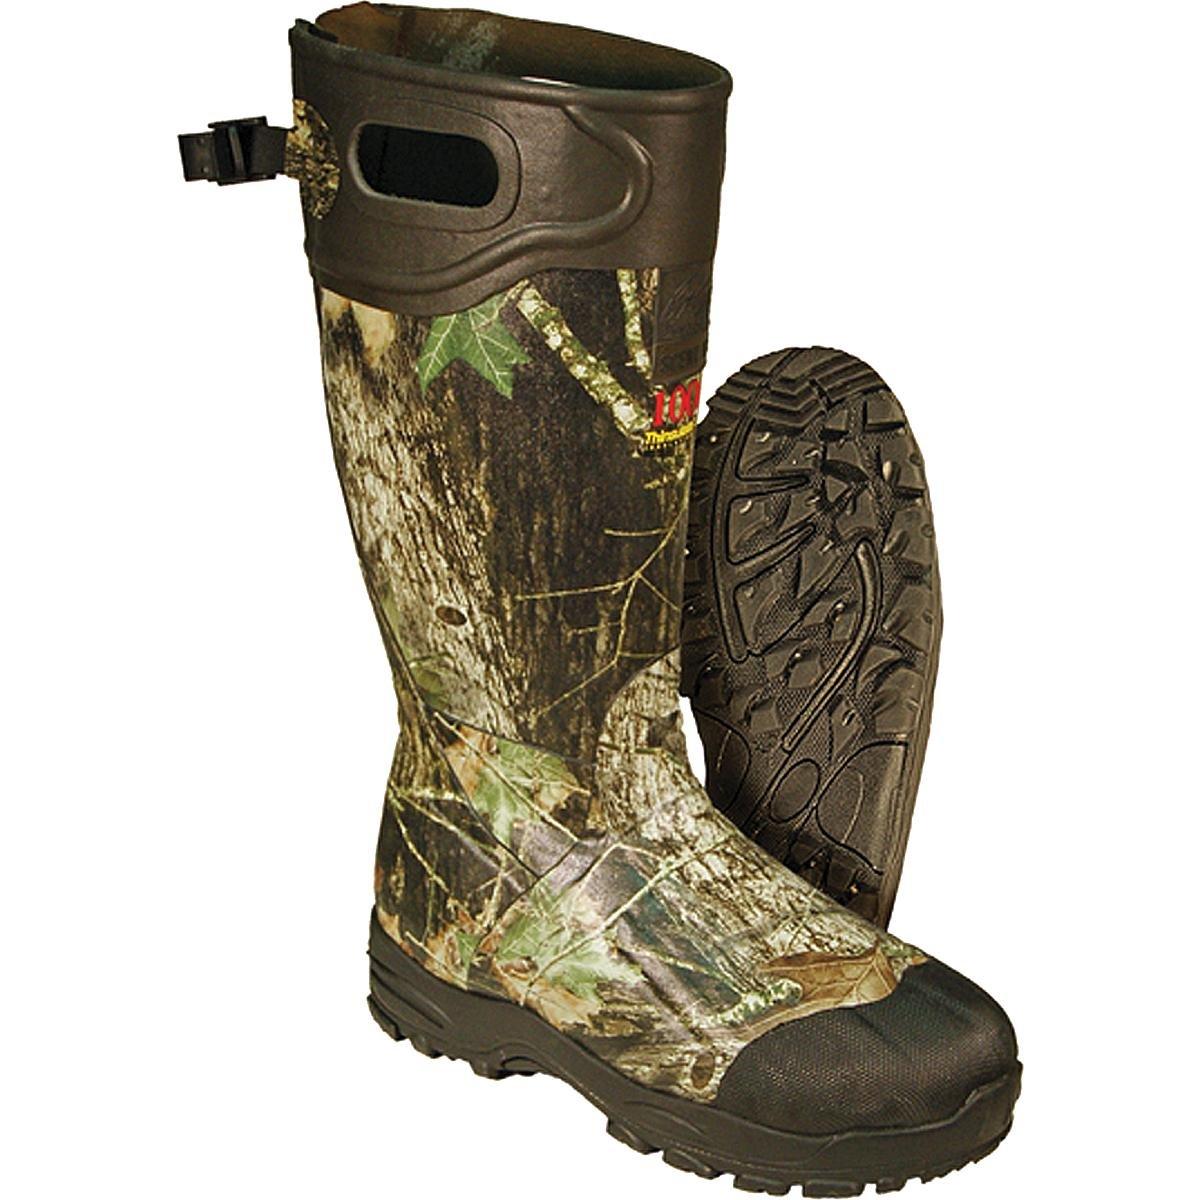 Itasca Men's Swampwalker Tall Waterproof Rain Boot, Camouflage, 12.0 D US